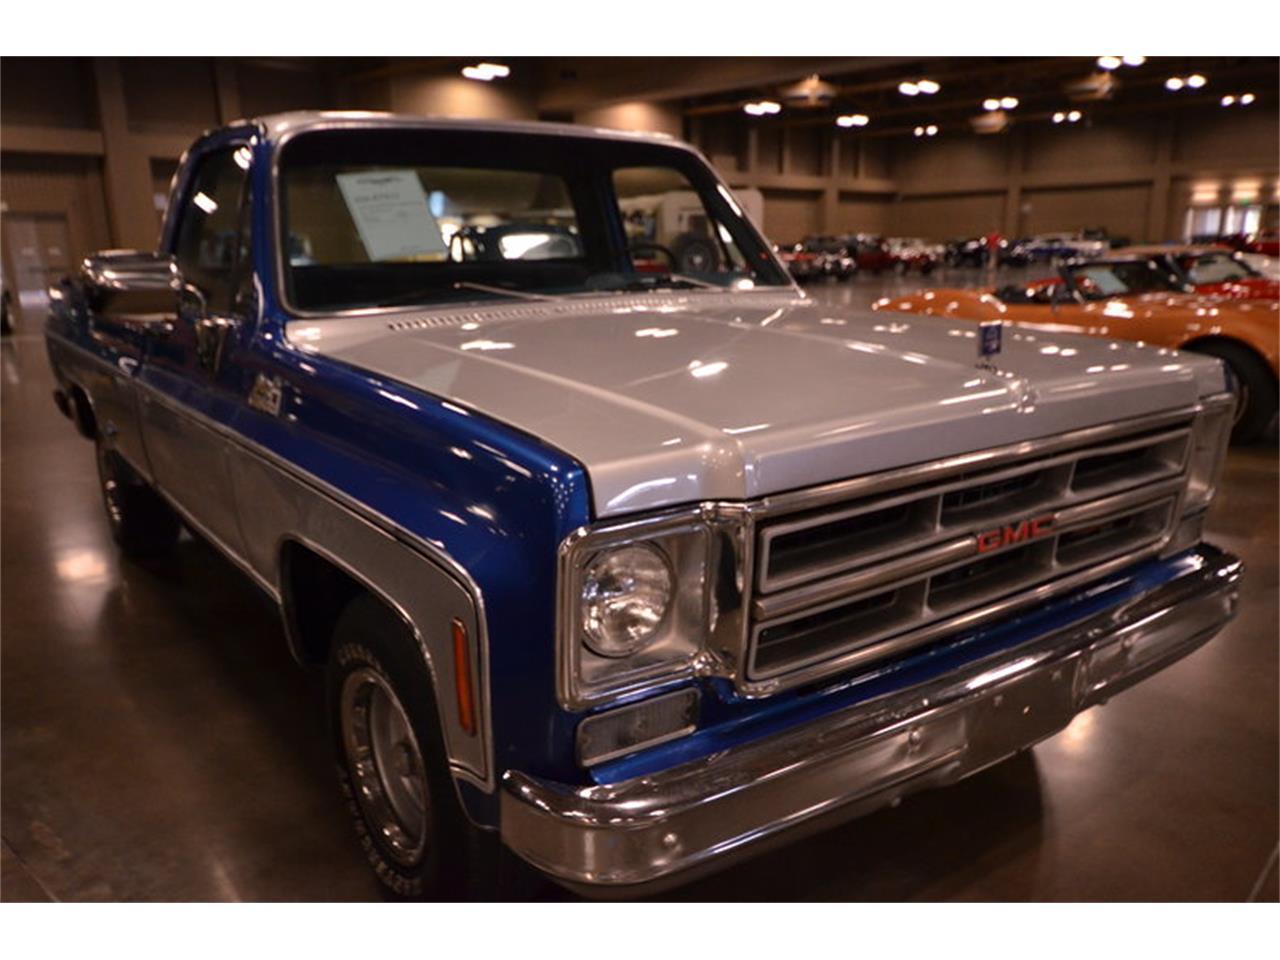 1975 Gmc Sierra For Sale Classiccars Com Cc 1024209